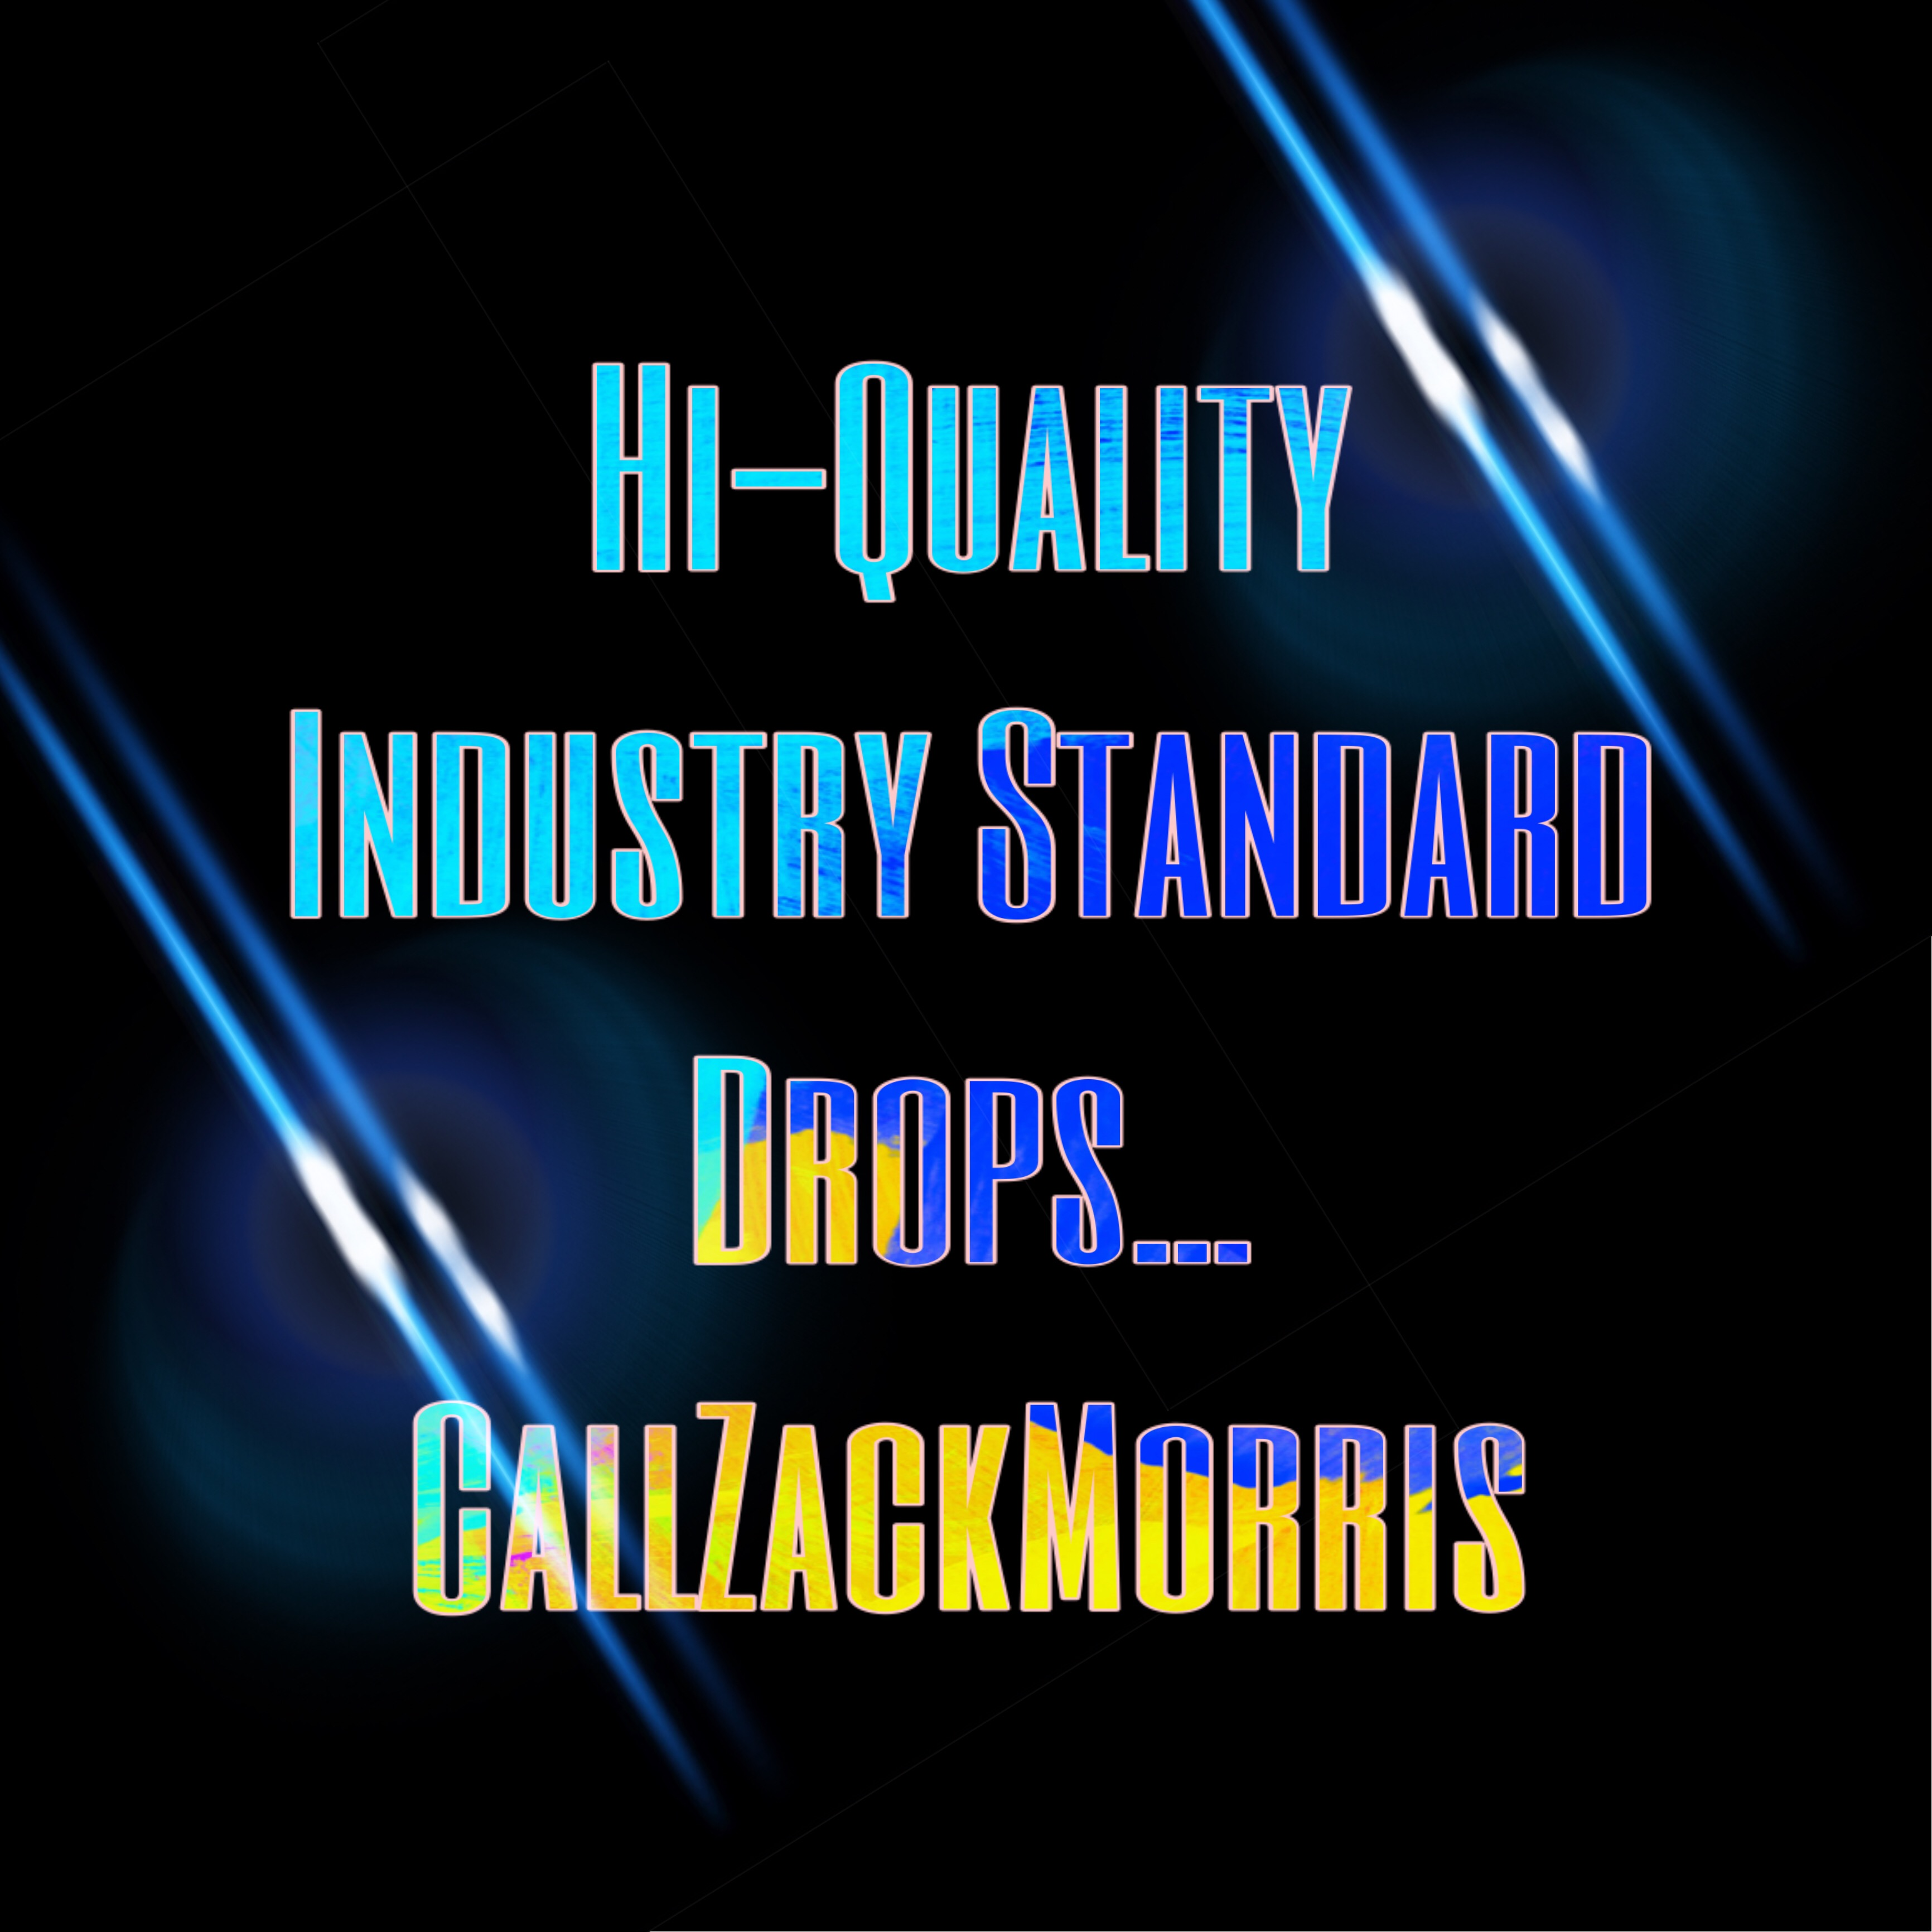 CallZackMorris DJ Drop Promo